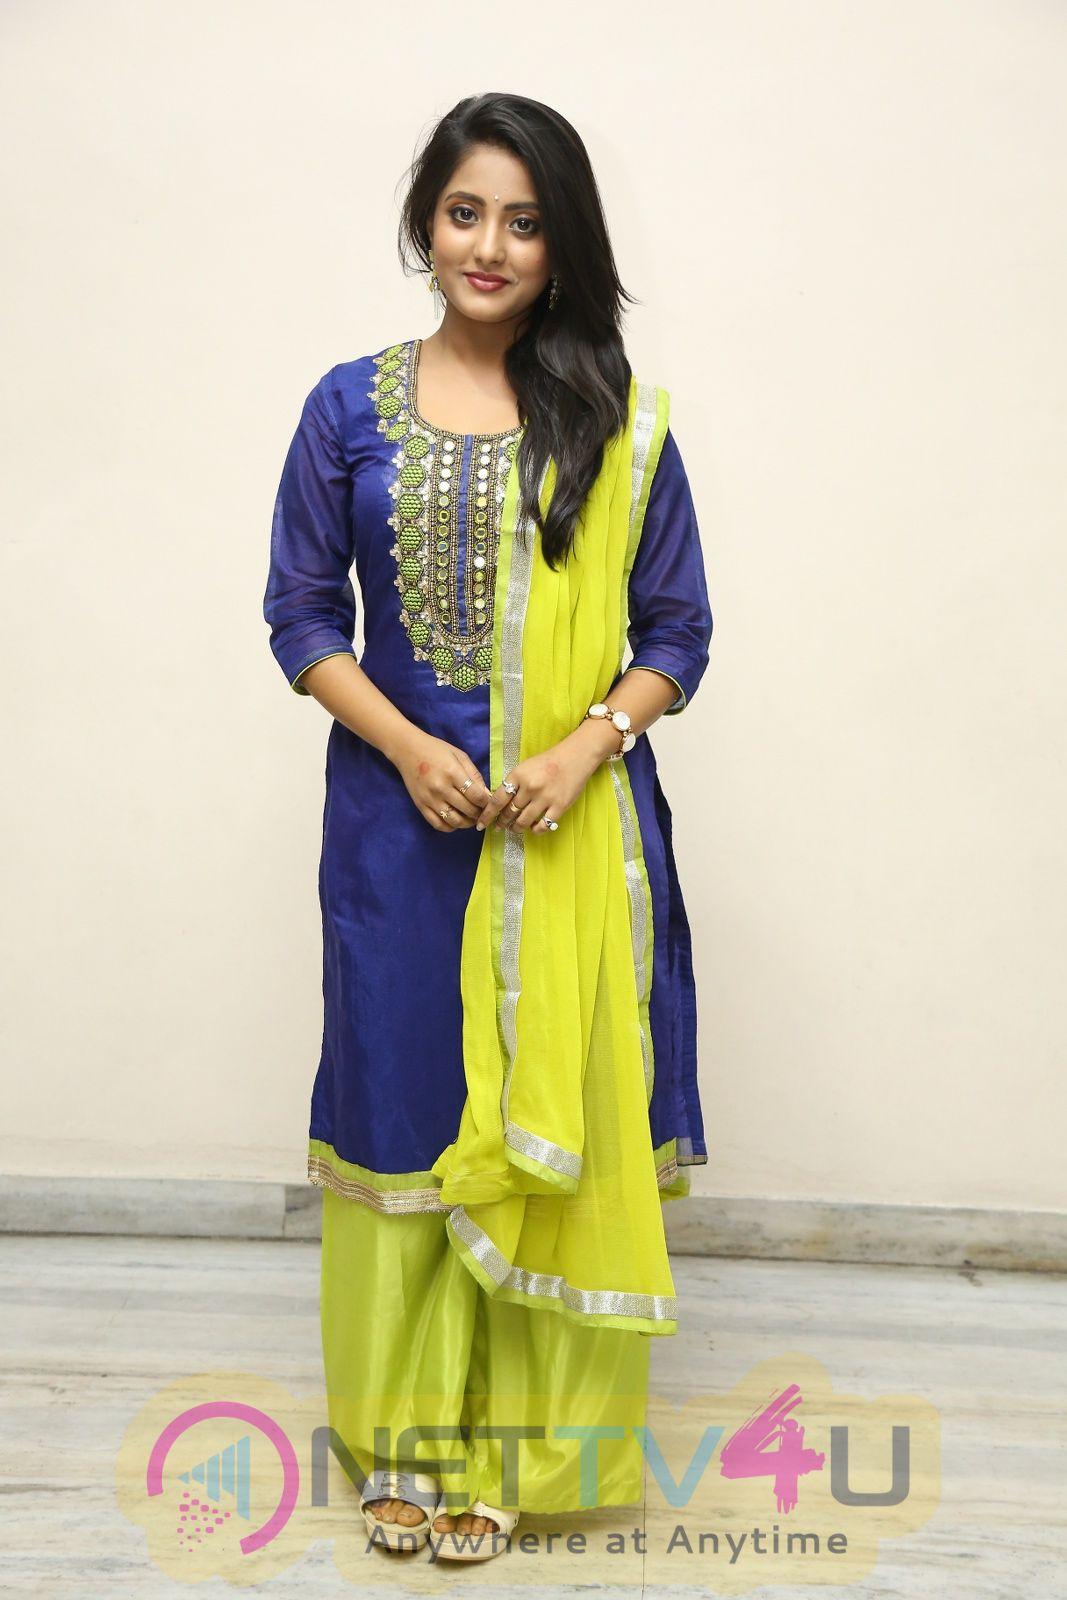 Actress Ulka Gupta Lovely Stills